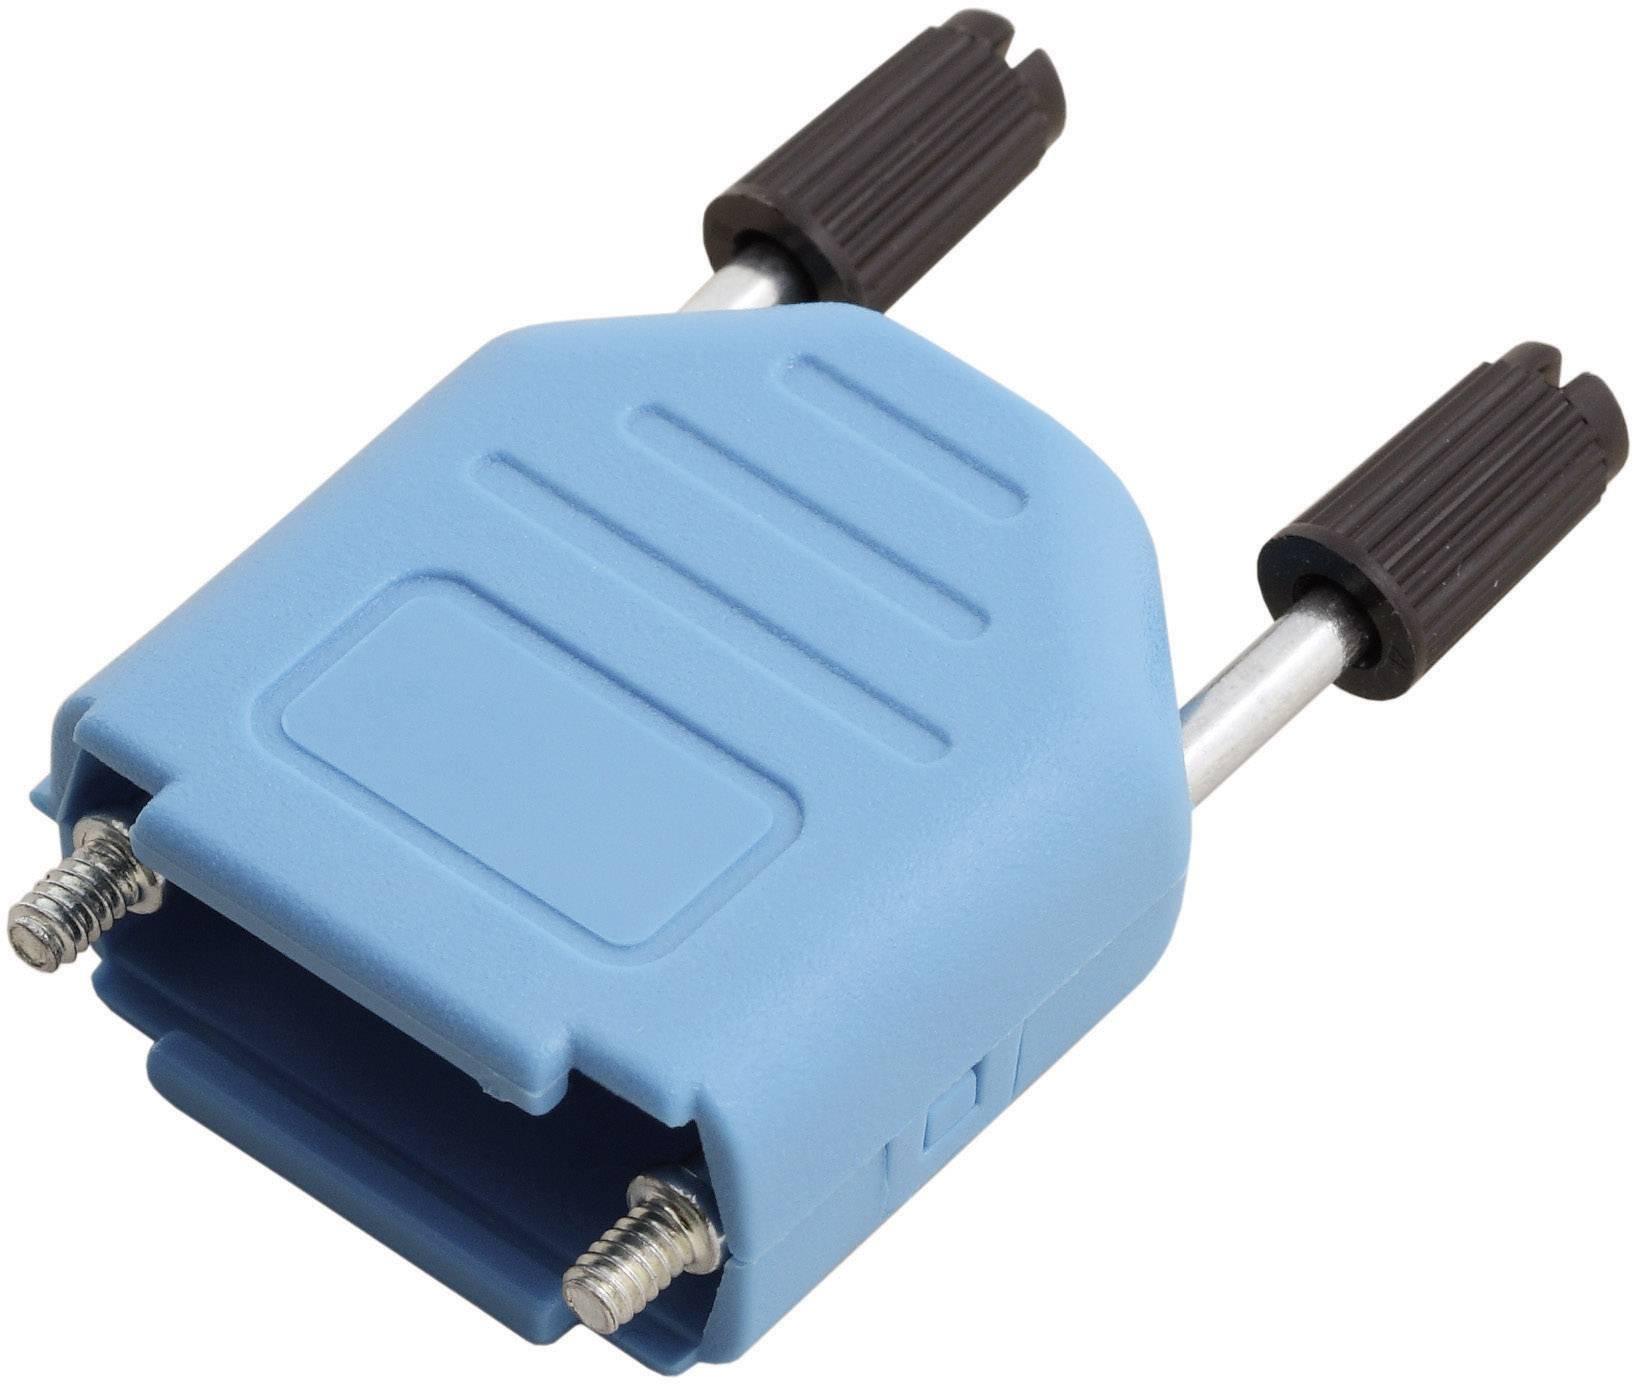 D-SUB pouzdro MH Connectors MHDPPK09-B-K, Pólů: 9, plast, 180 °, modrá, 1 ks